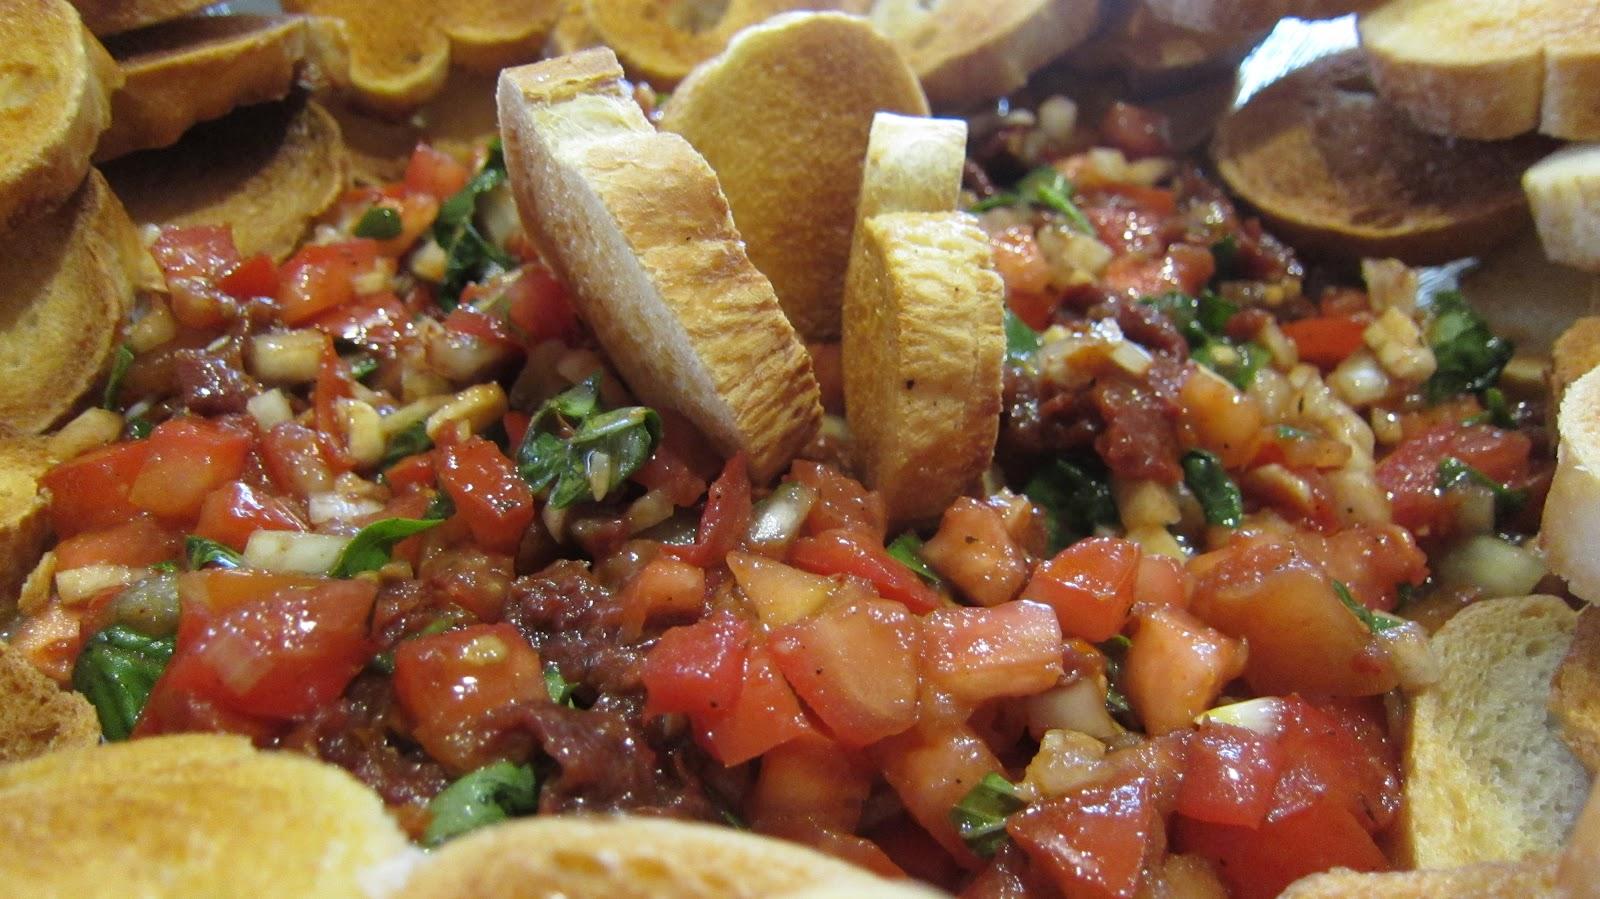 Mary's Kitchen Diaries: Balsamic Double Tomato Bruschetta